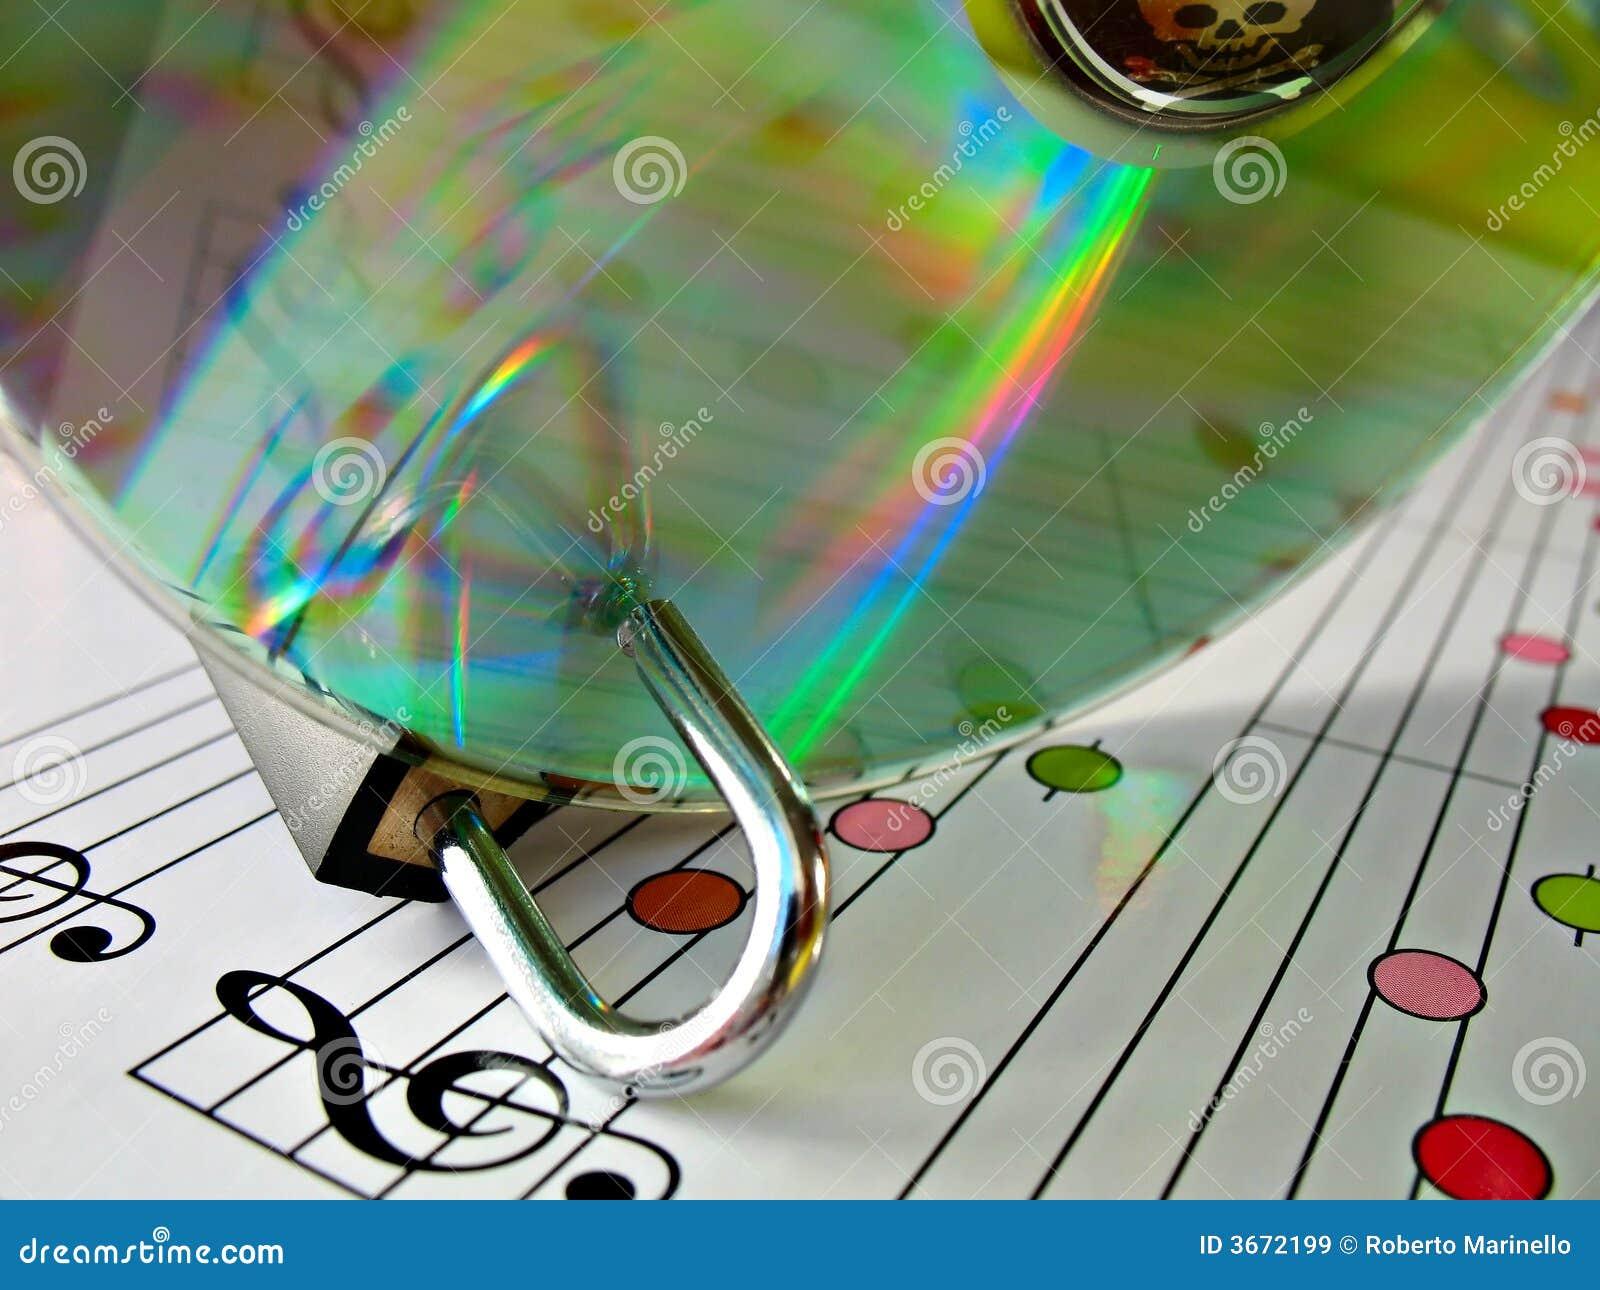 5-million-dollar verdict in US music piracy case